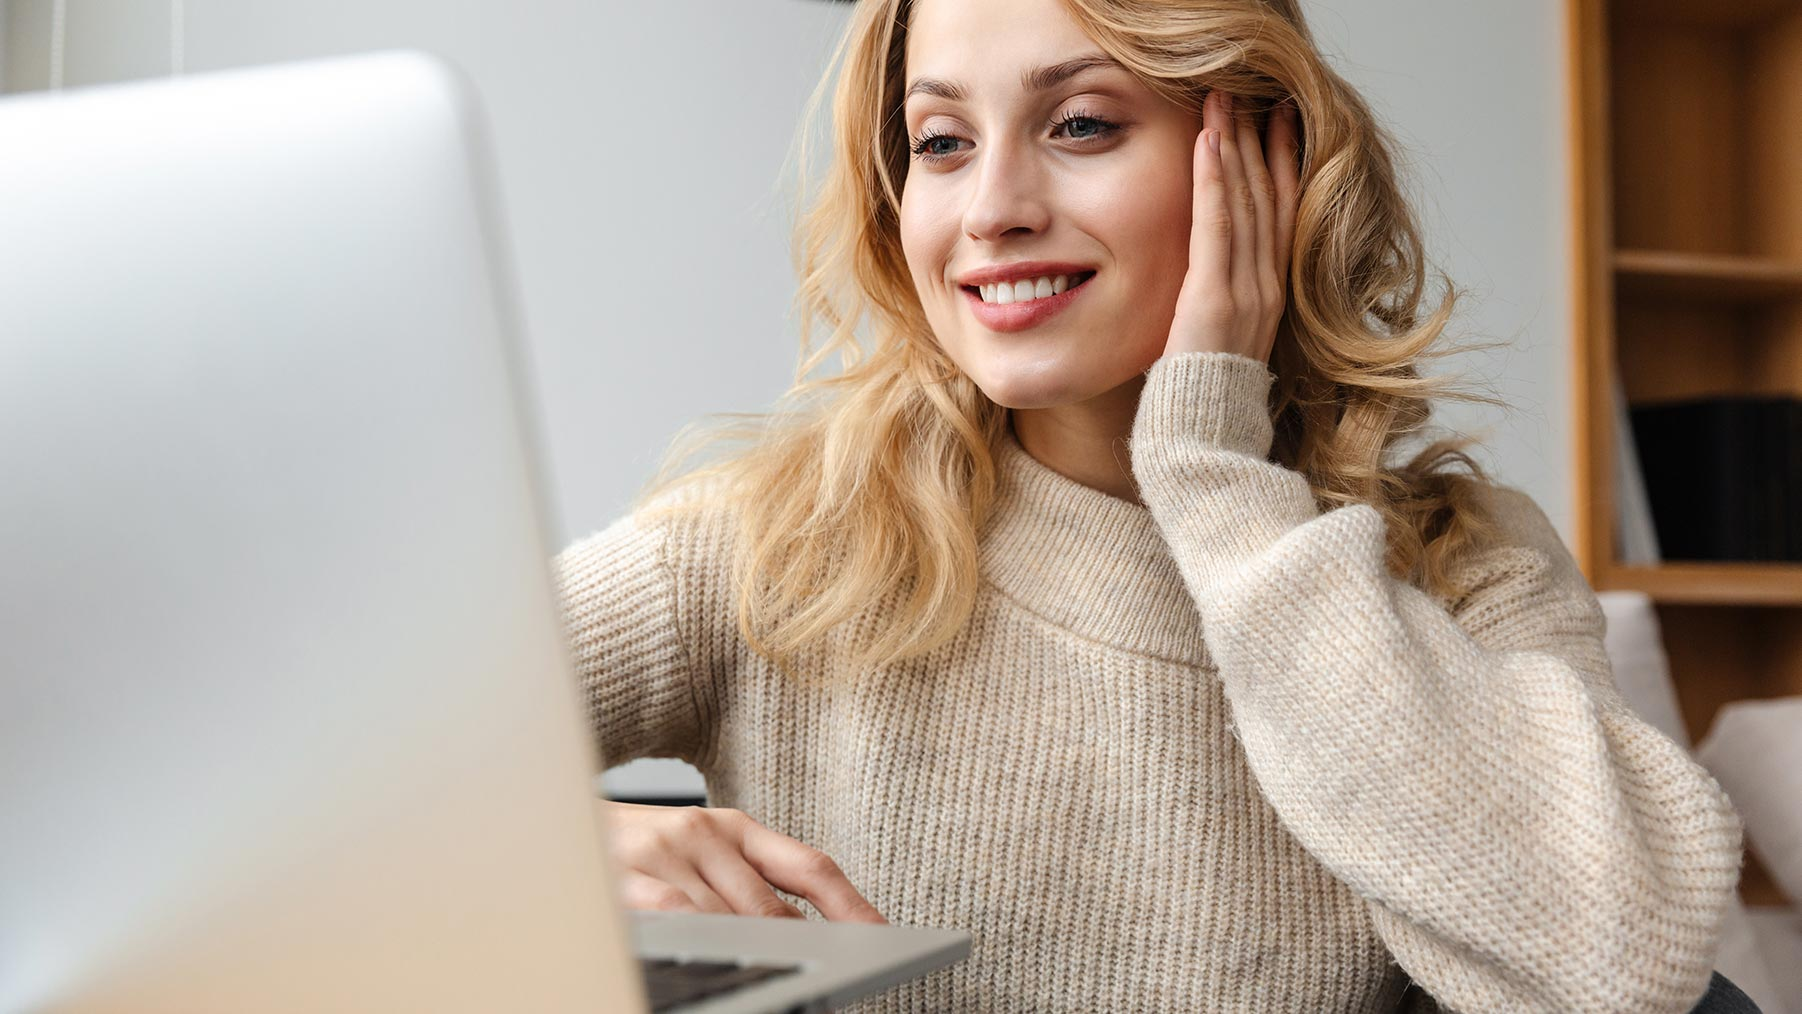 visita neurologo online cefalea telemedicina mal di testa